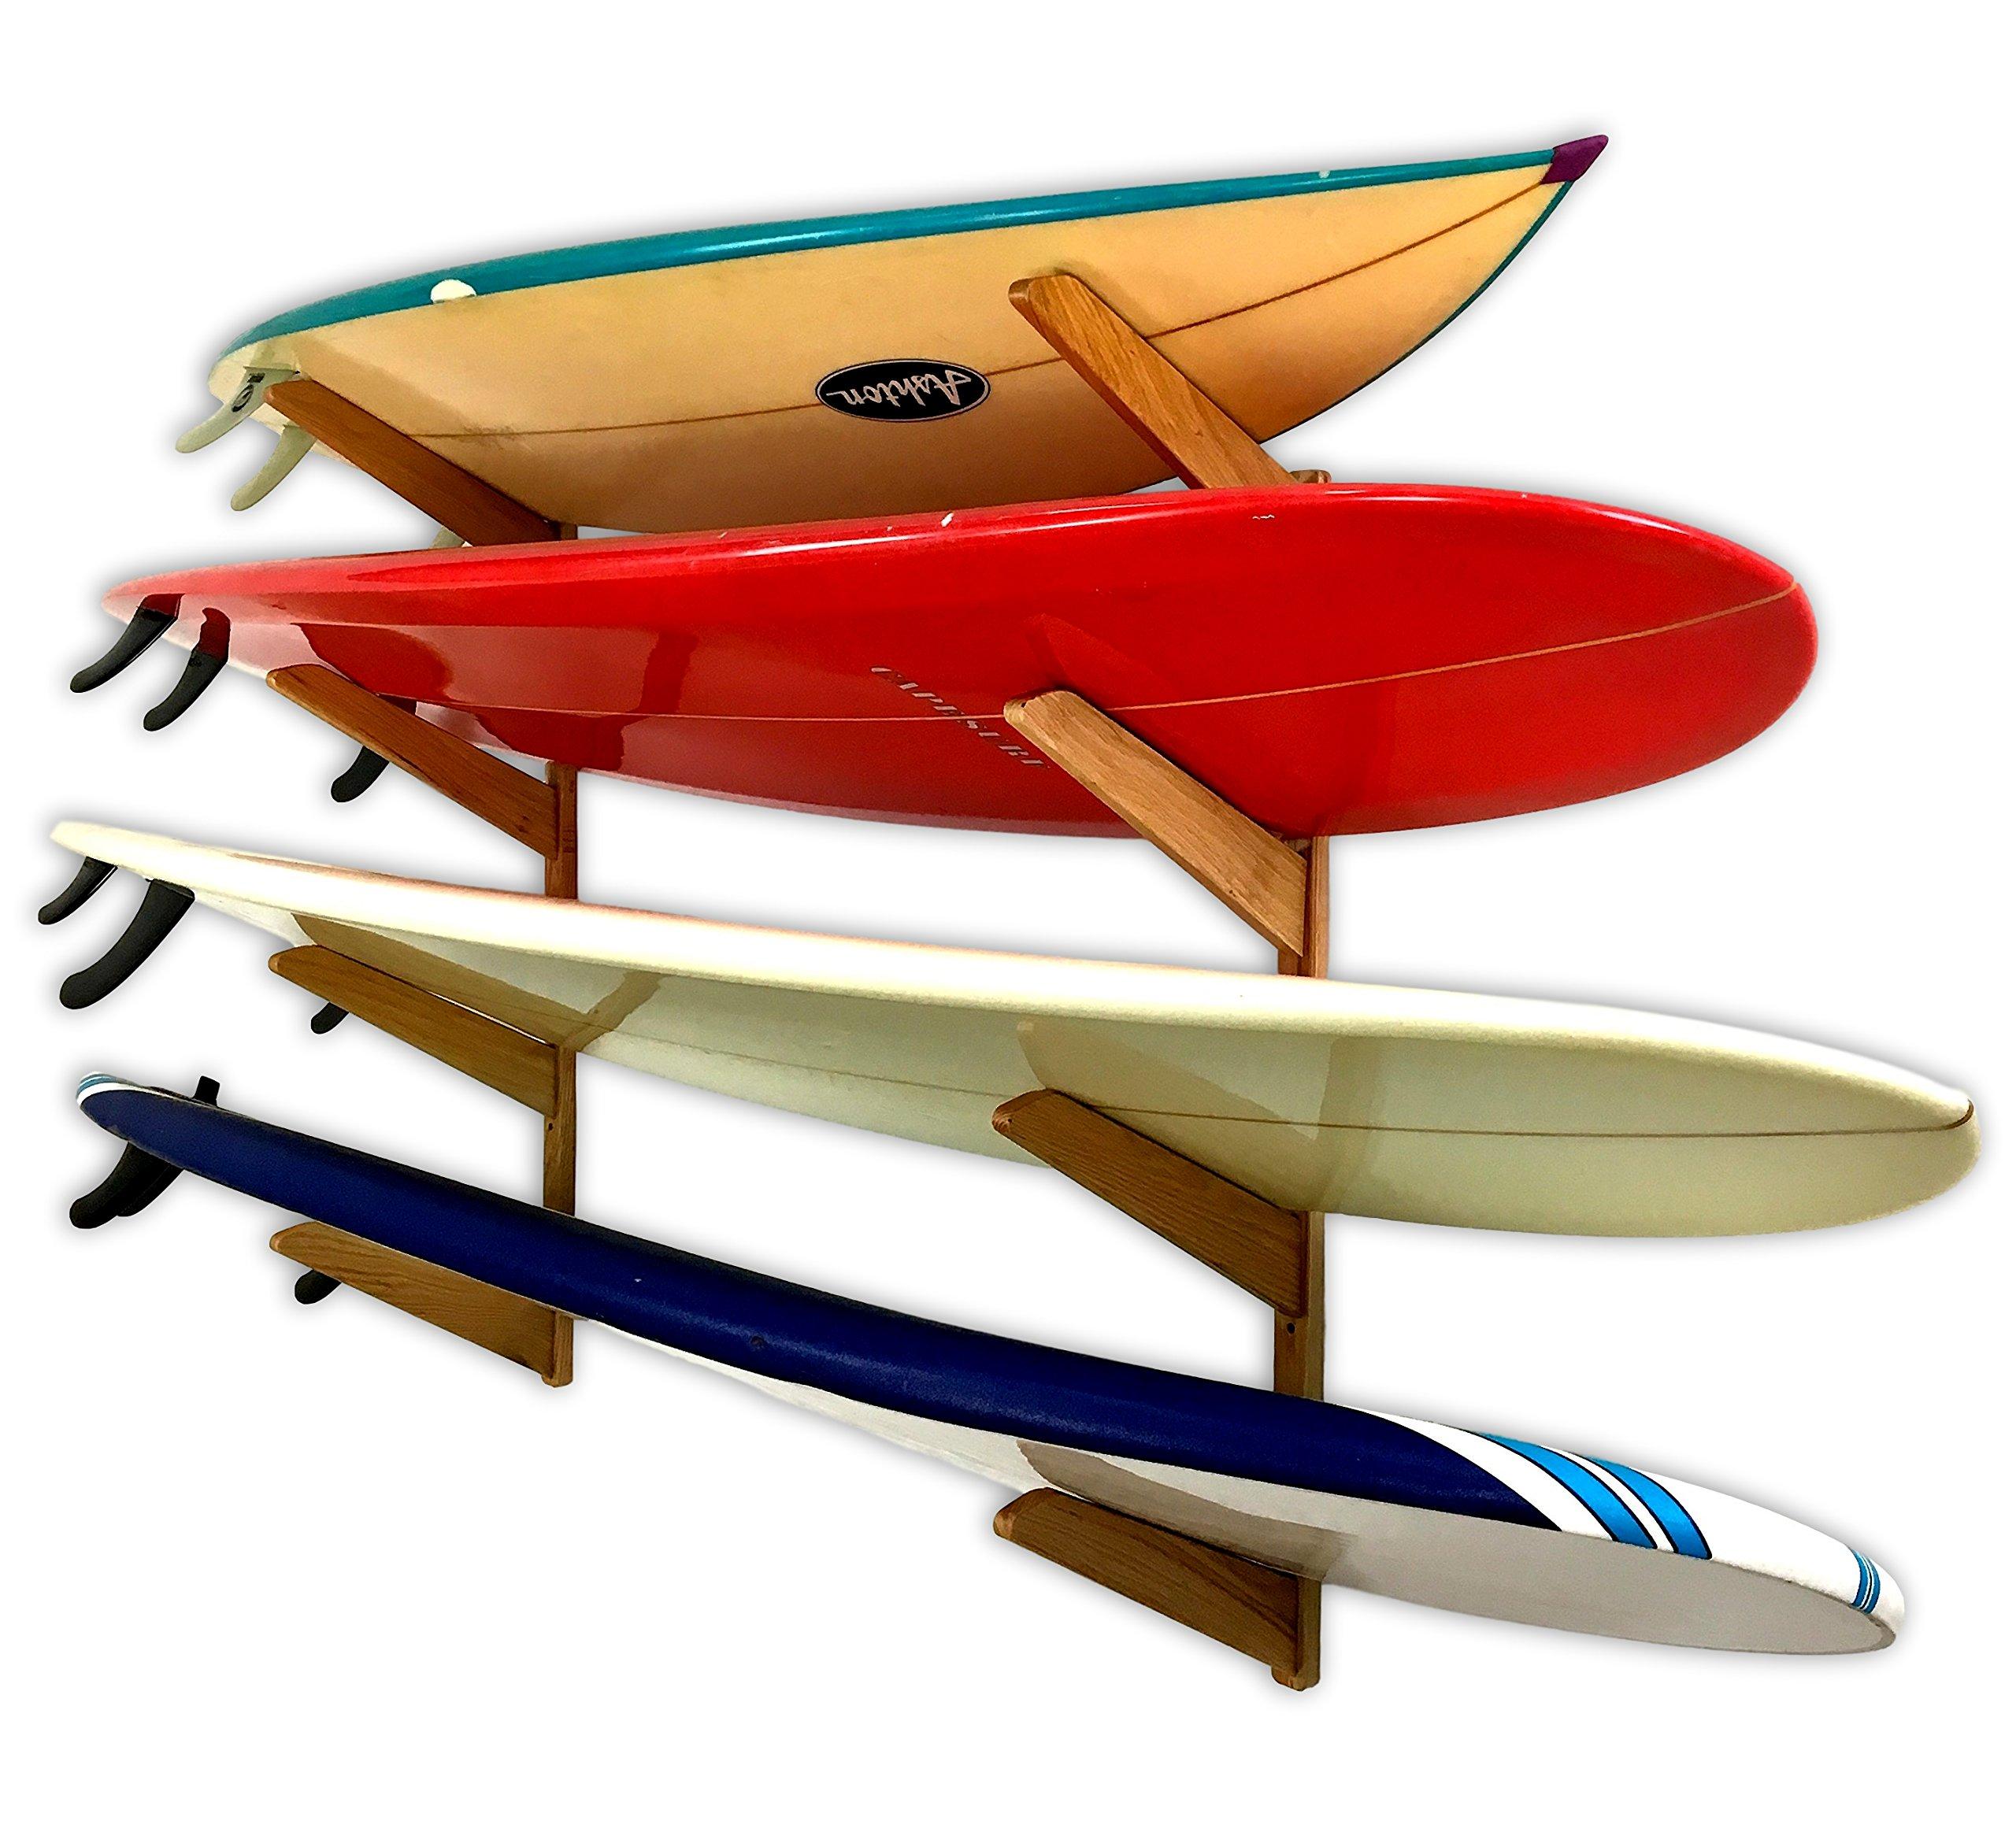 Timber Surfboard Wall Rack - 4 Surfboards Storage - Wood Home & Garage Surf Mount Brackets